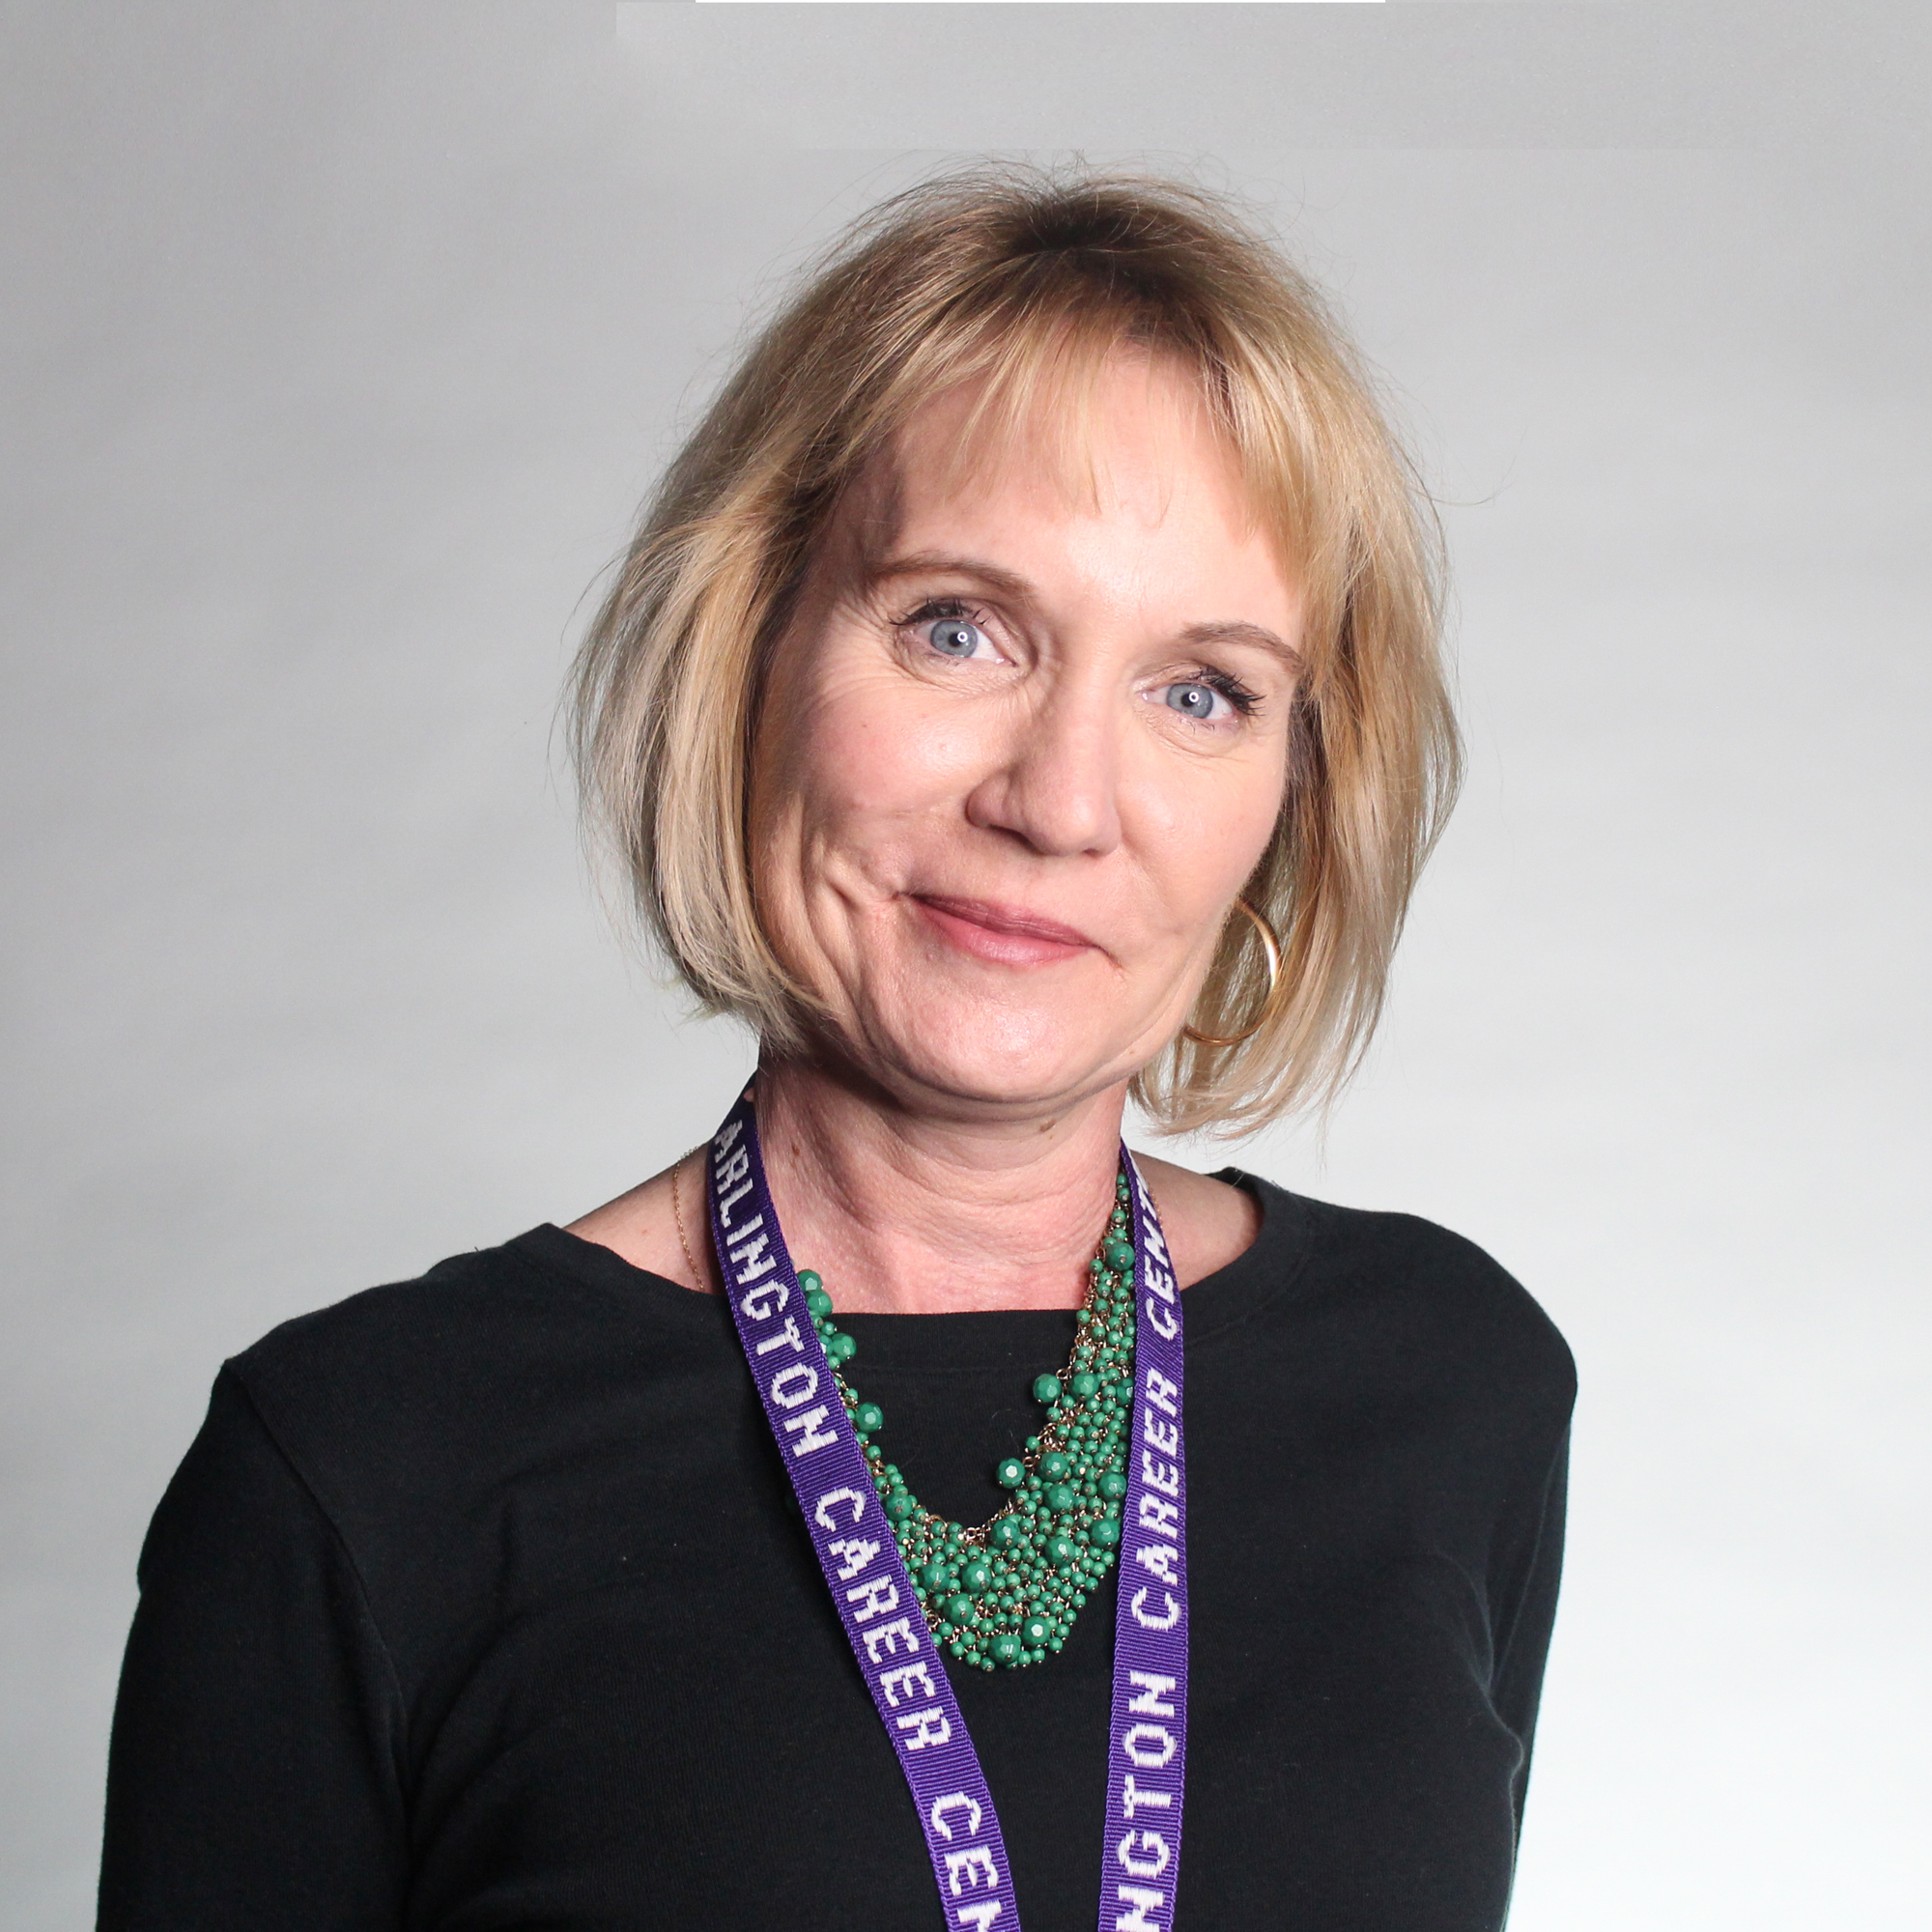 Ms. Christina Kirsch